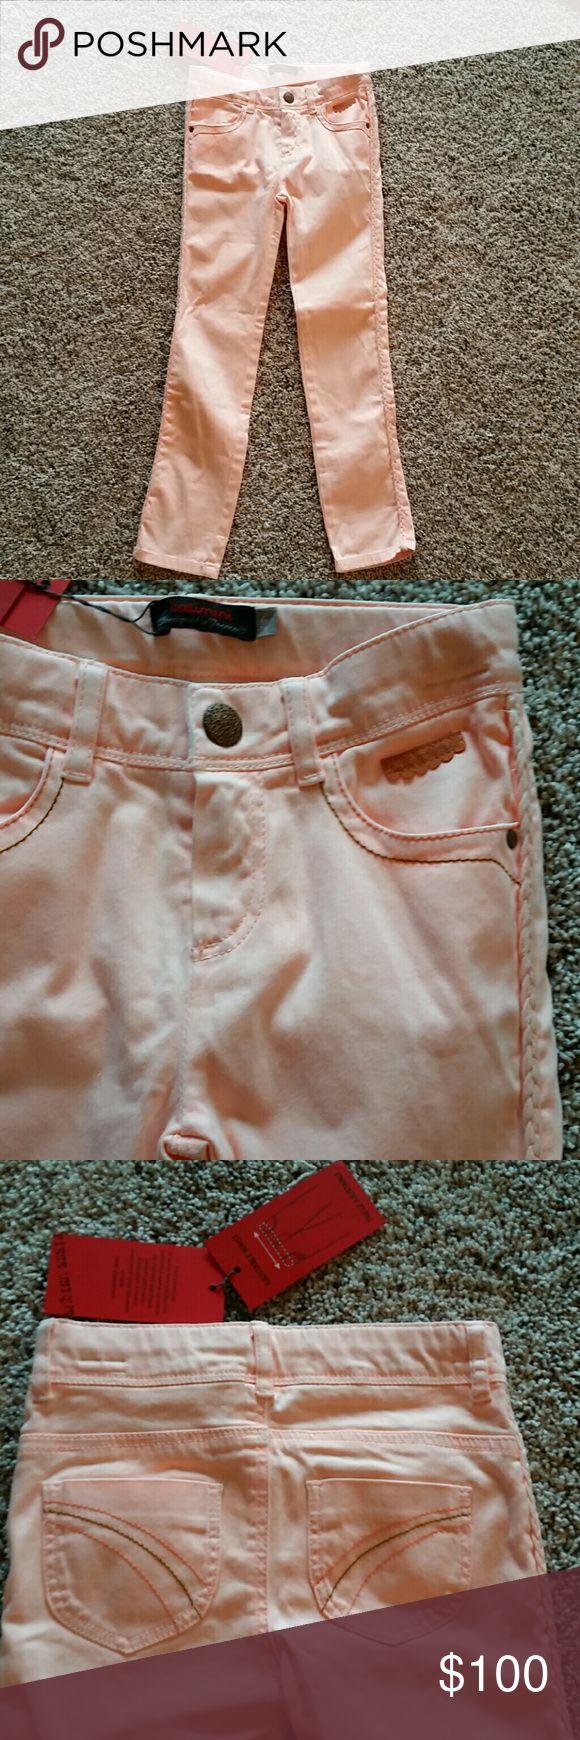 NWT Catimini girls peach pants So cute!!!! Adjustable waist. Cute braided detail along outer edge of legs. I discount bundles! Make me an offer! Catimini Bottoms Casual